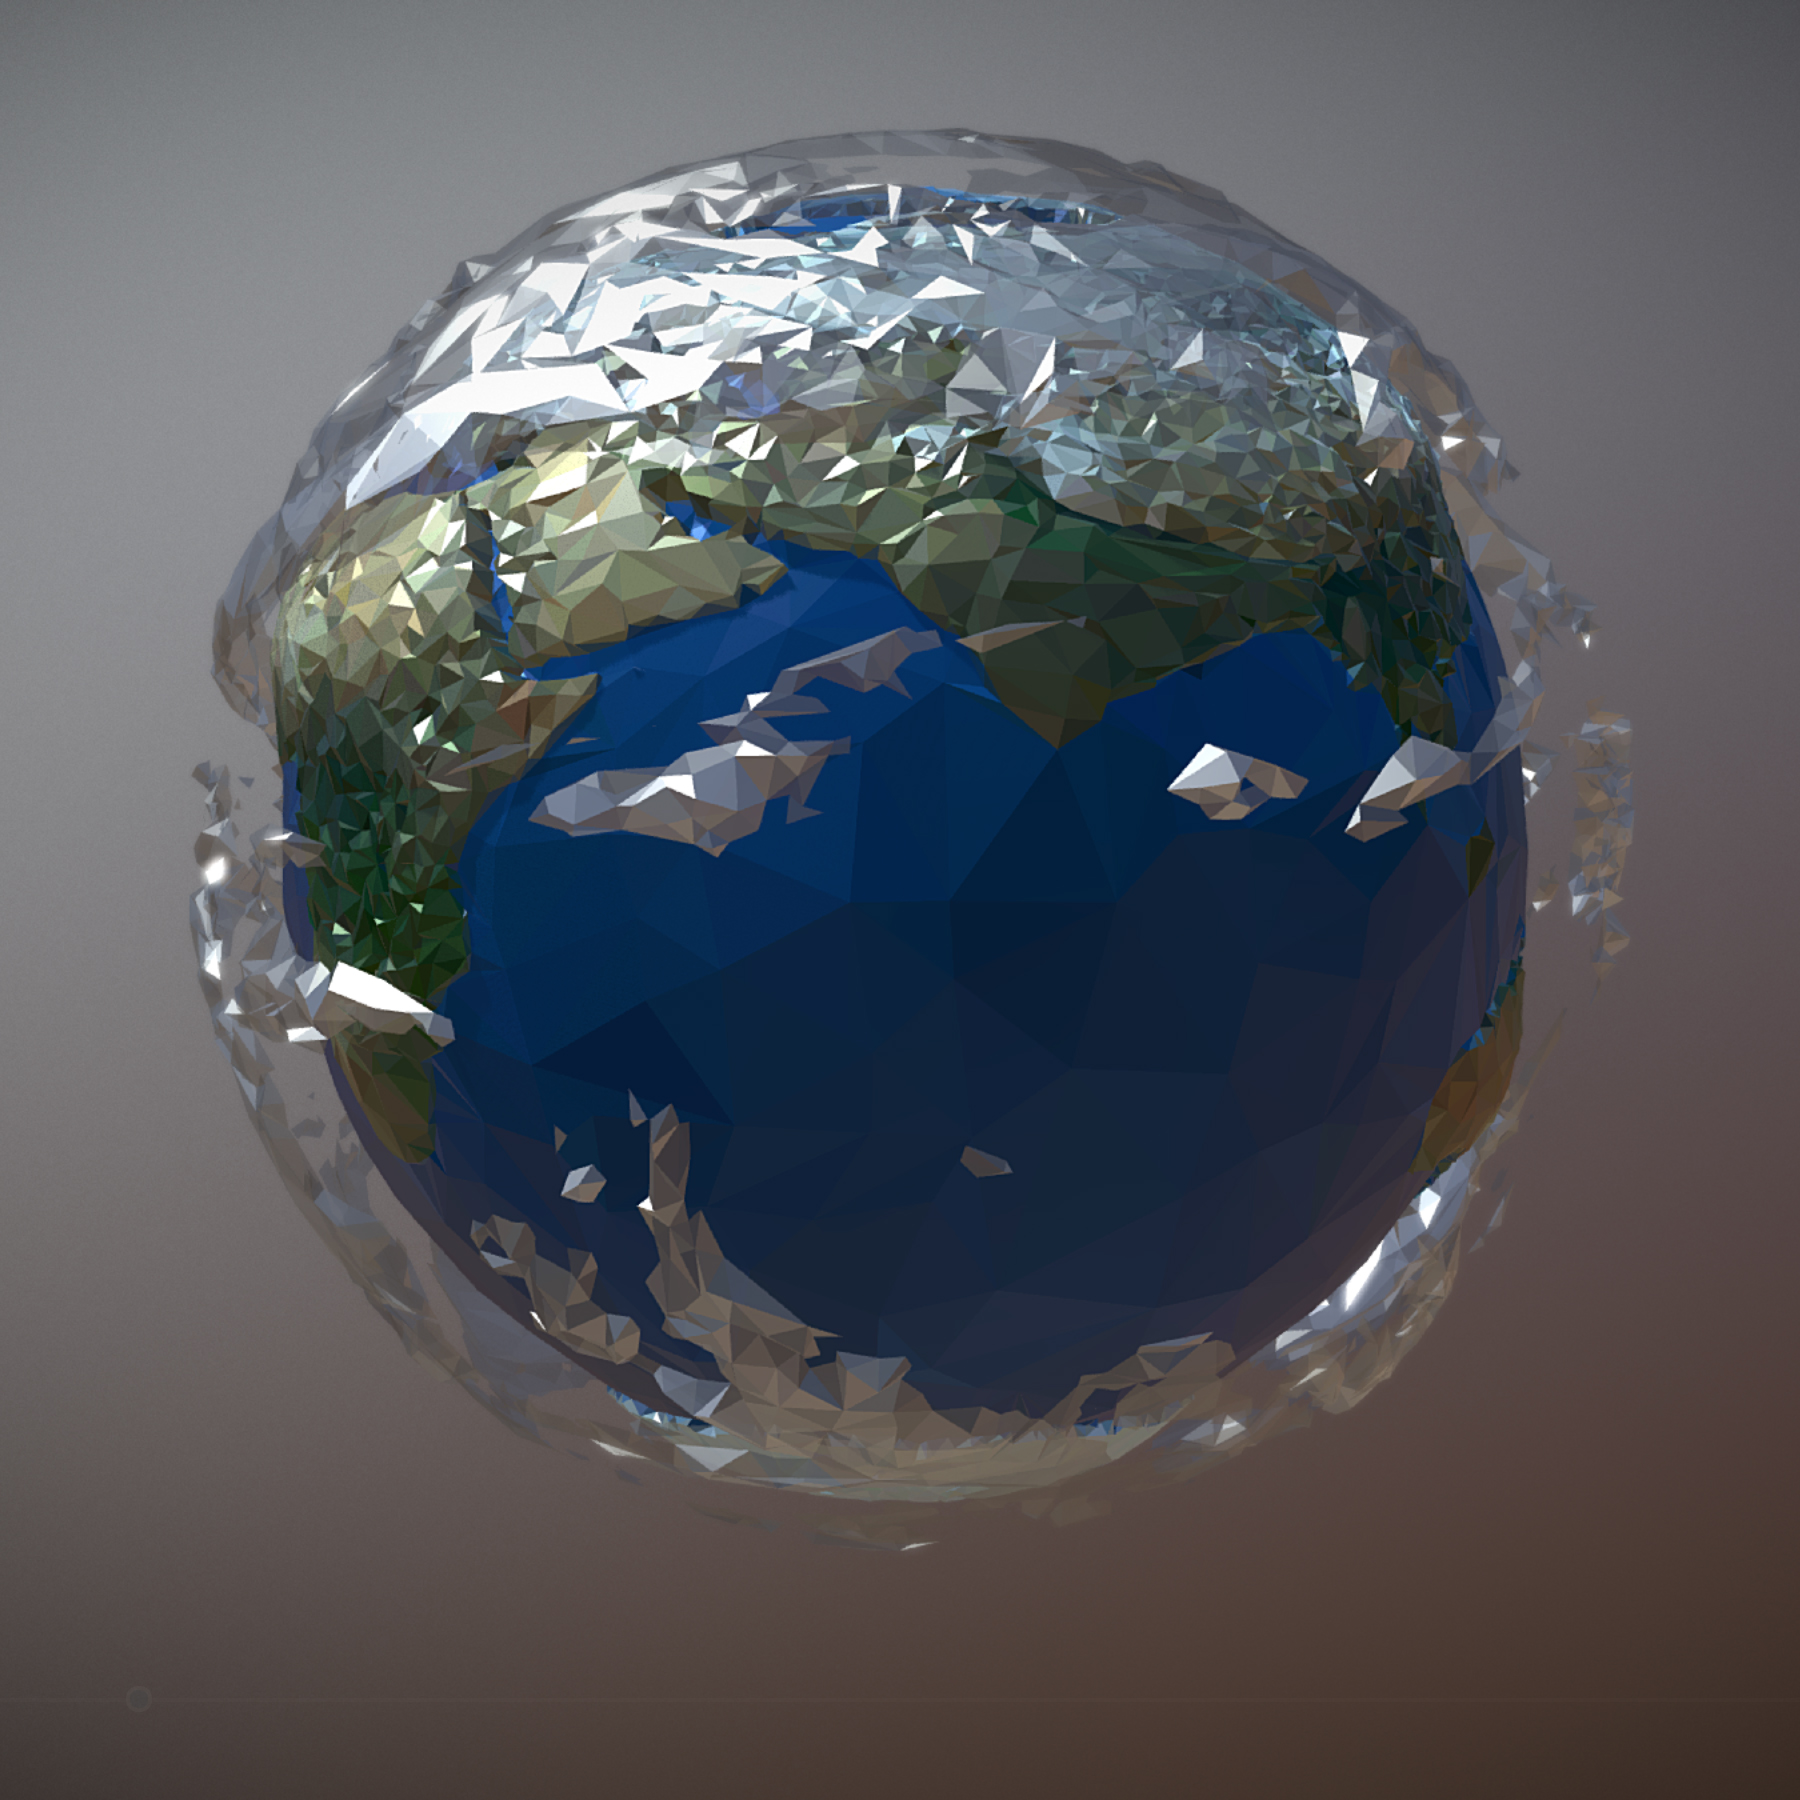 Animated low polygon art planet earth 3d model buy animated low animated low polygon art planet earth 3d model 0 publicscrutiny Choice Image